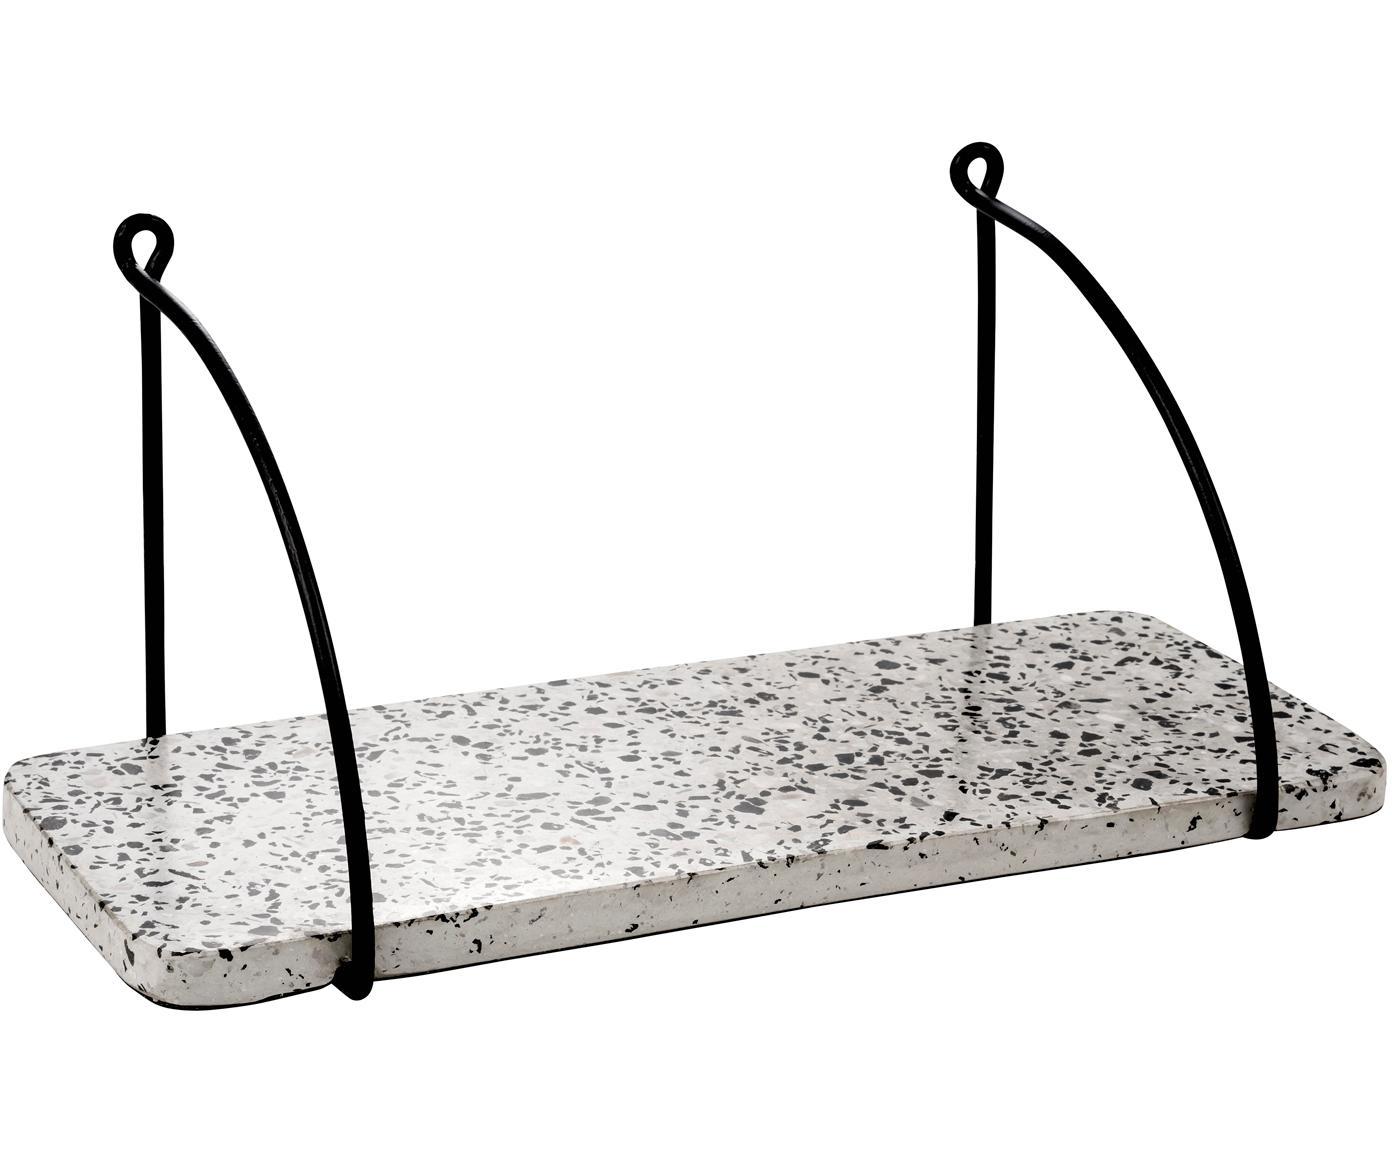 Terrazzo-Wandregal Porter, Regalbrett: Terrazzo, Halterung: Metall, lackiert, Weiss, Grautöne, Schwarz, 40 x 18 cm